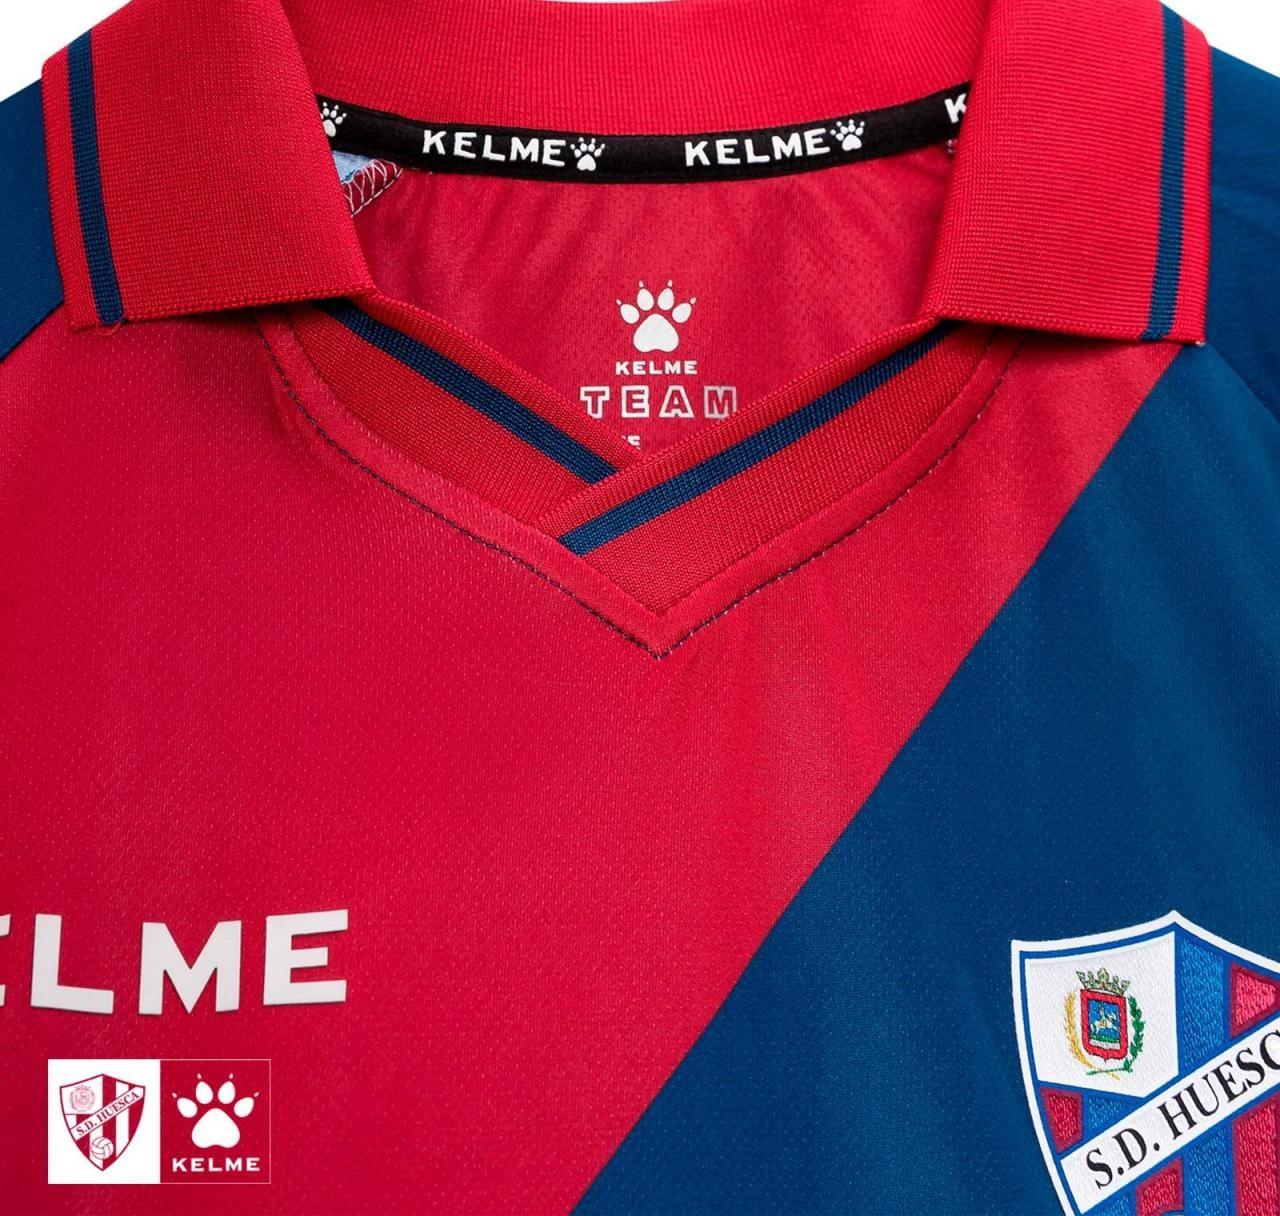 Huesca 2018-19 Kelme Home, Away & Third Kits